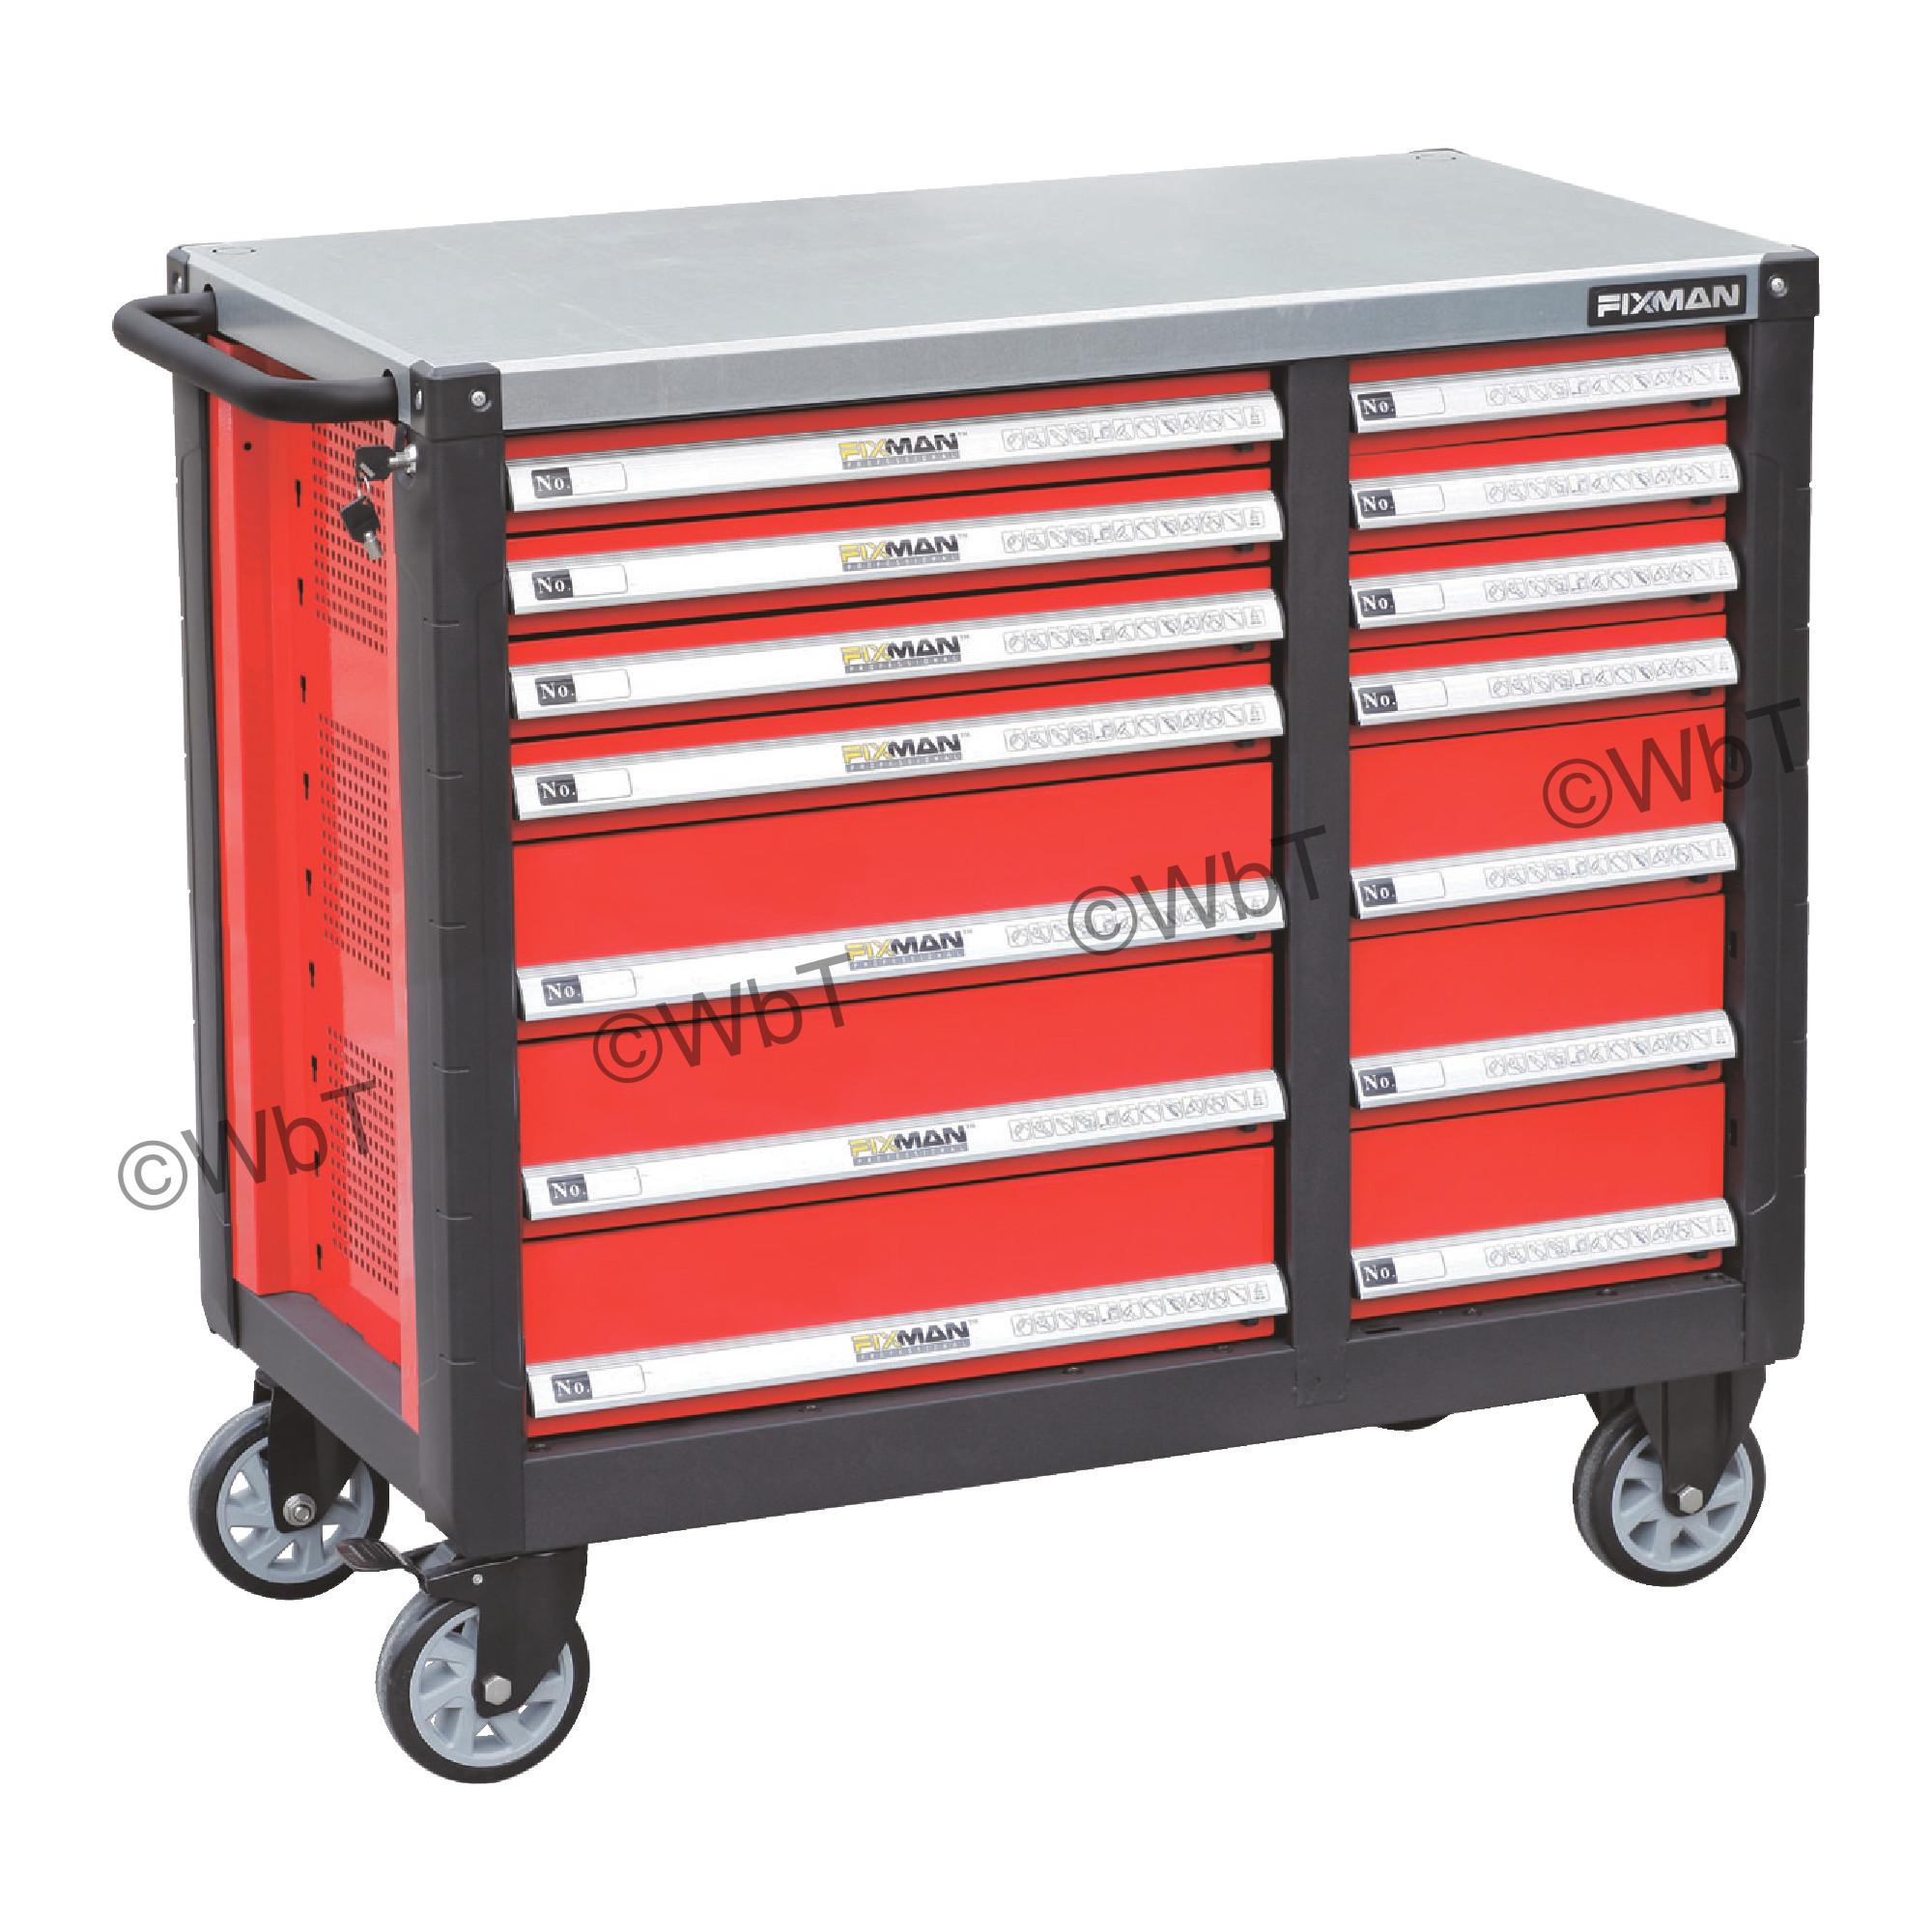 14 Drawer Mobile Workbench